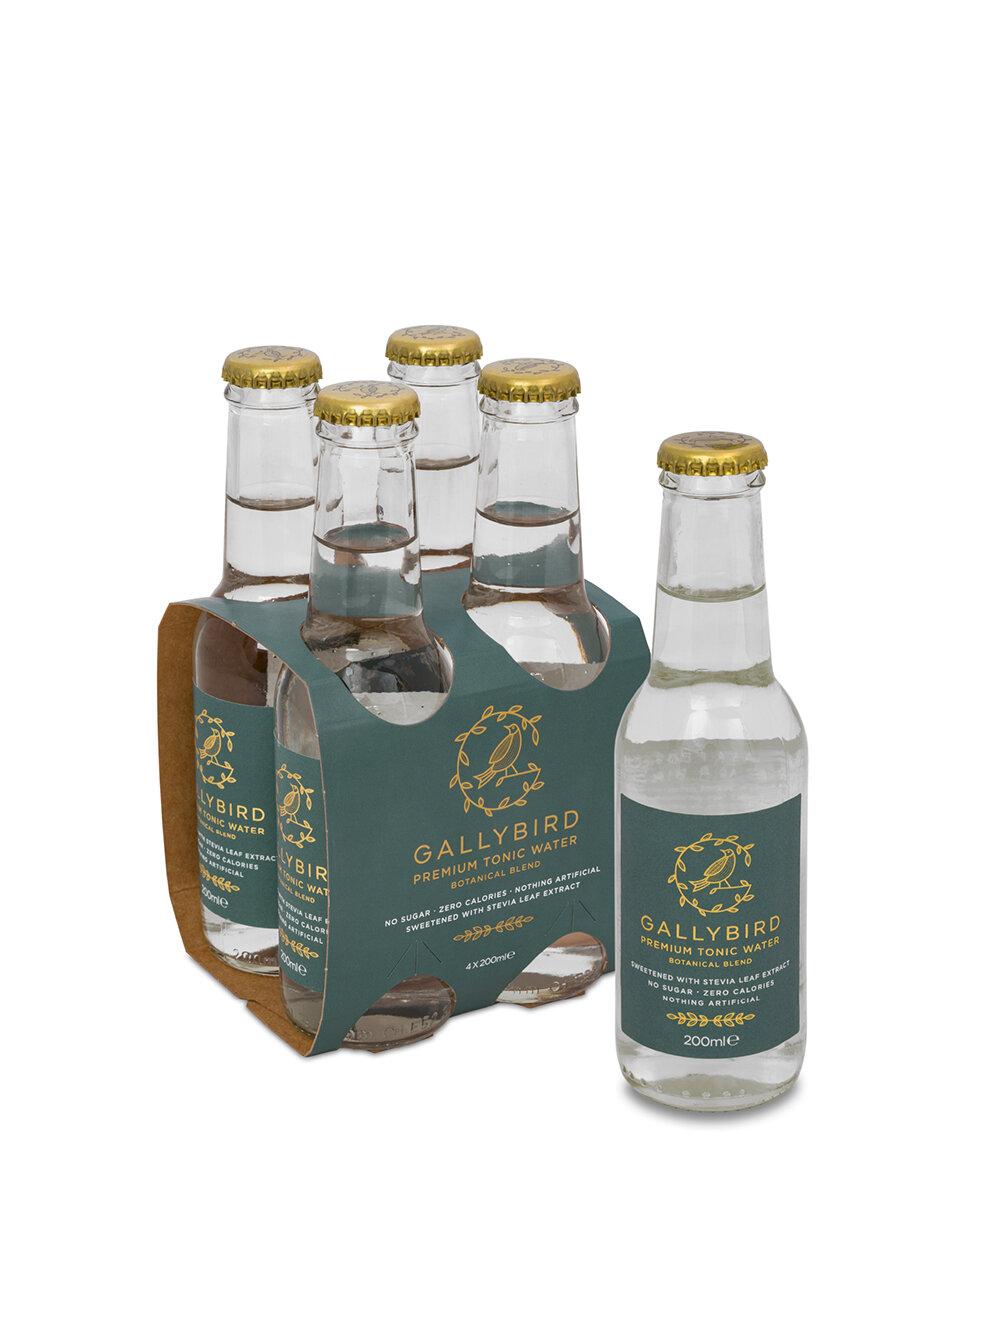 Gallybird - Premium Tonic Water Botanical Blend